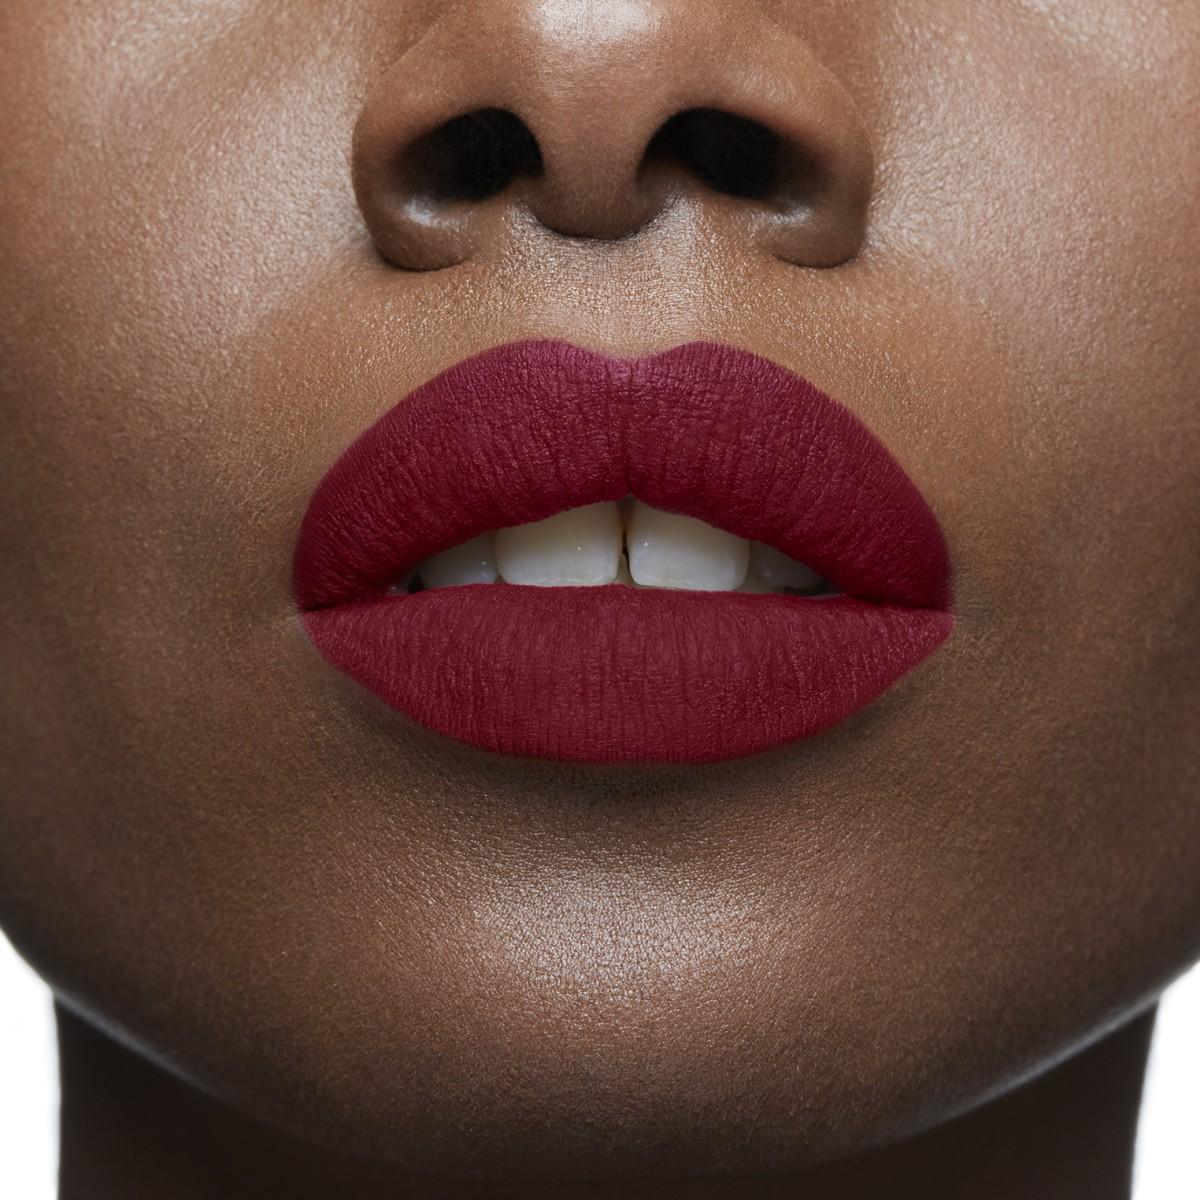 Woman Beauty - Very Prive - Christian Louboutin